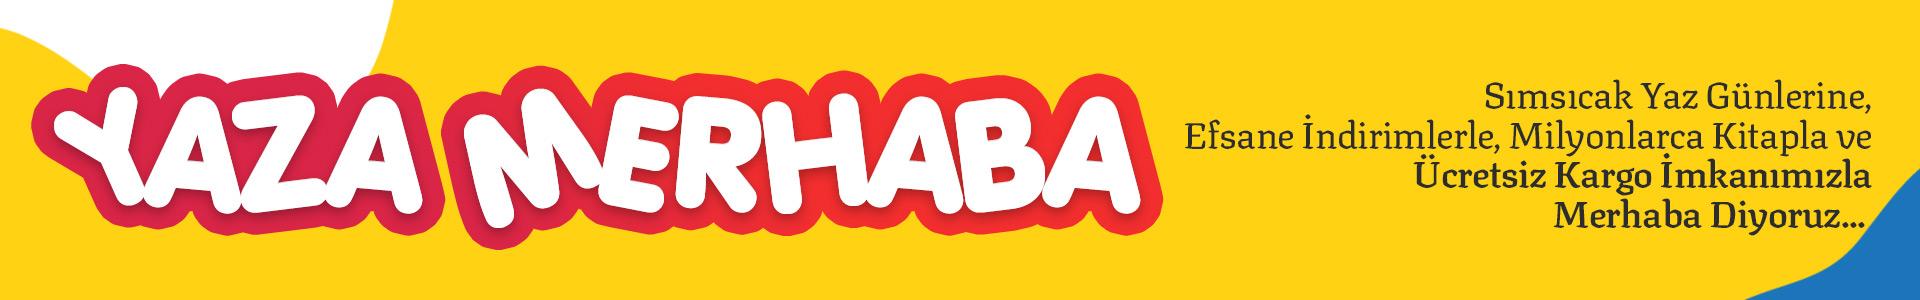 yaza-merhaba-ust-banner.jpg (132 KB)